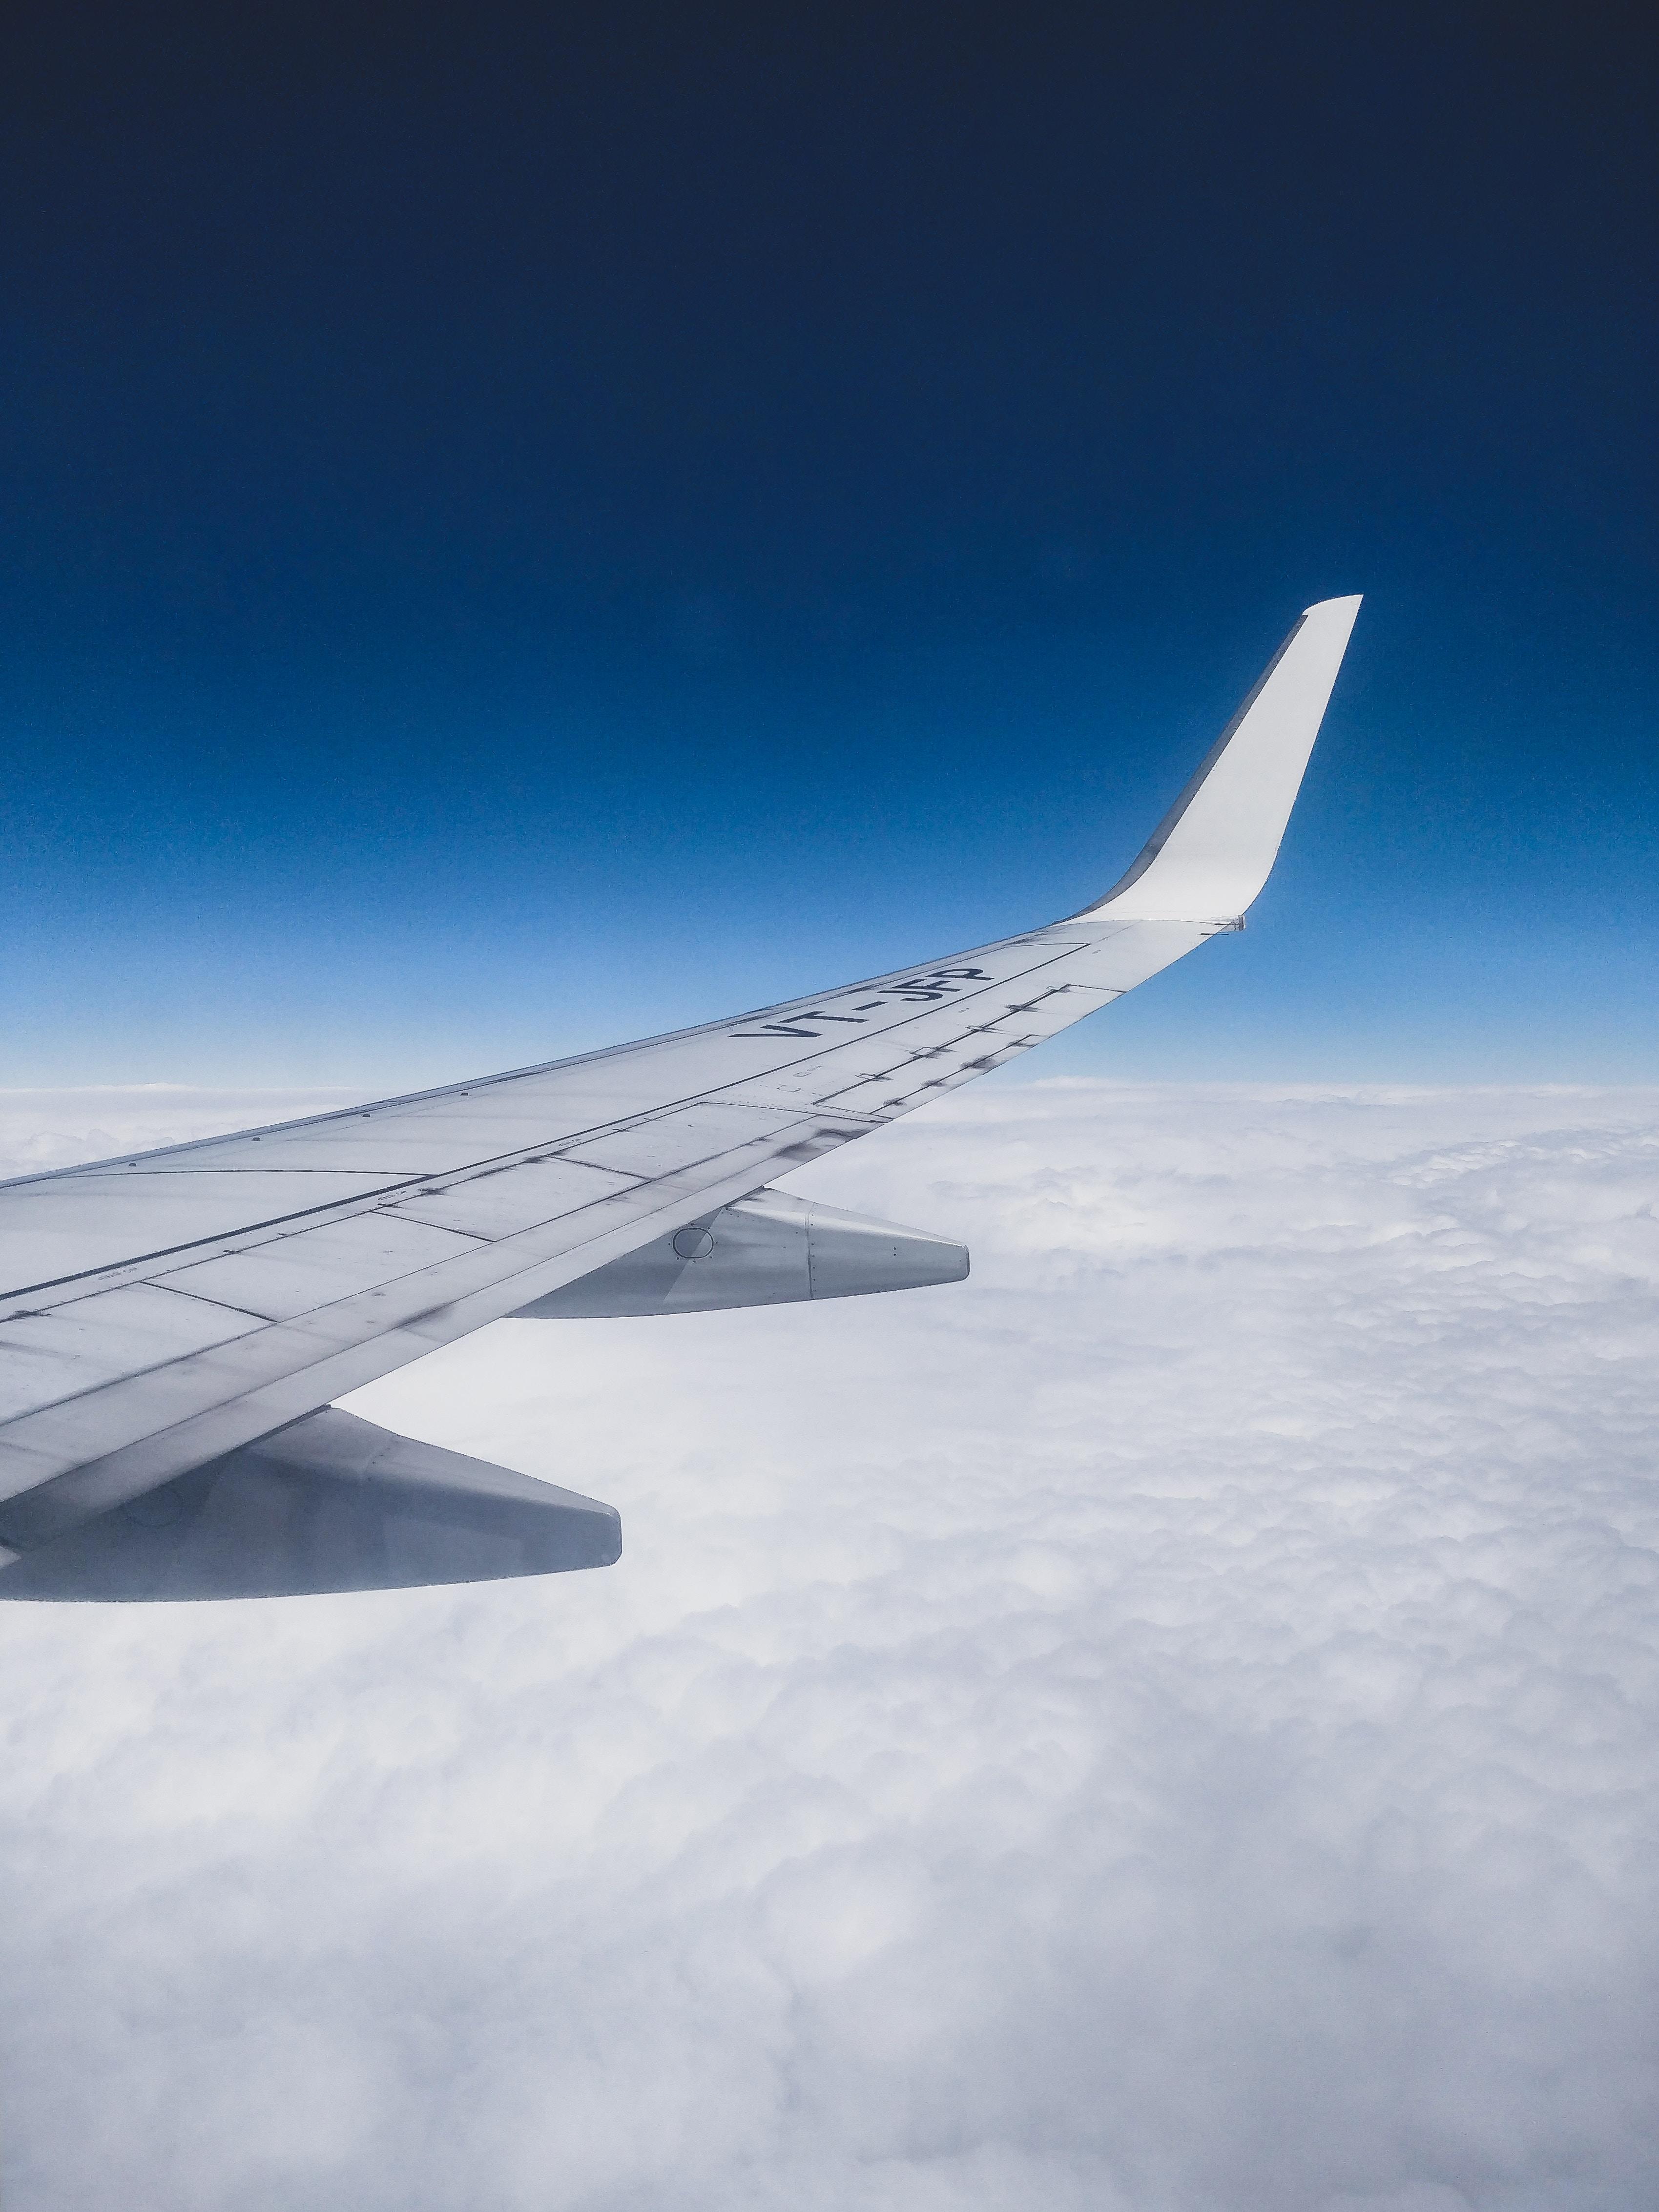 cheap flights America, 4th July flights